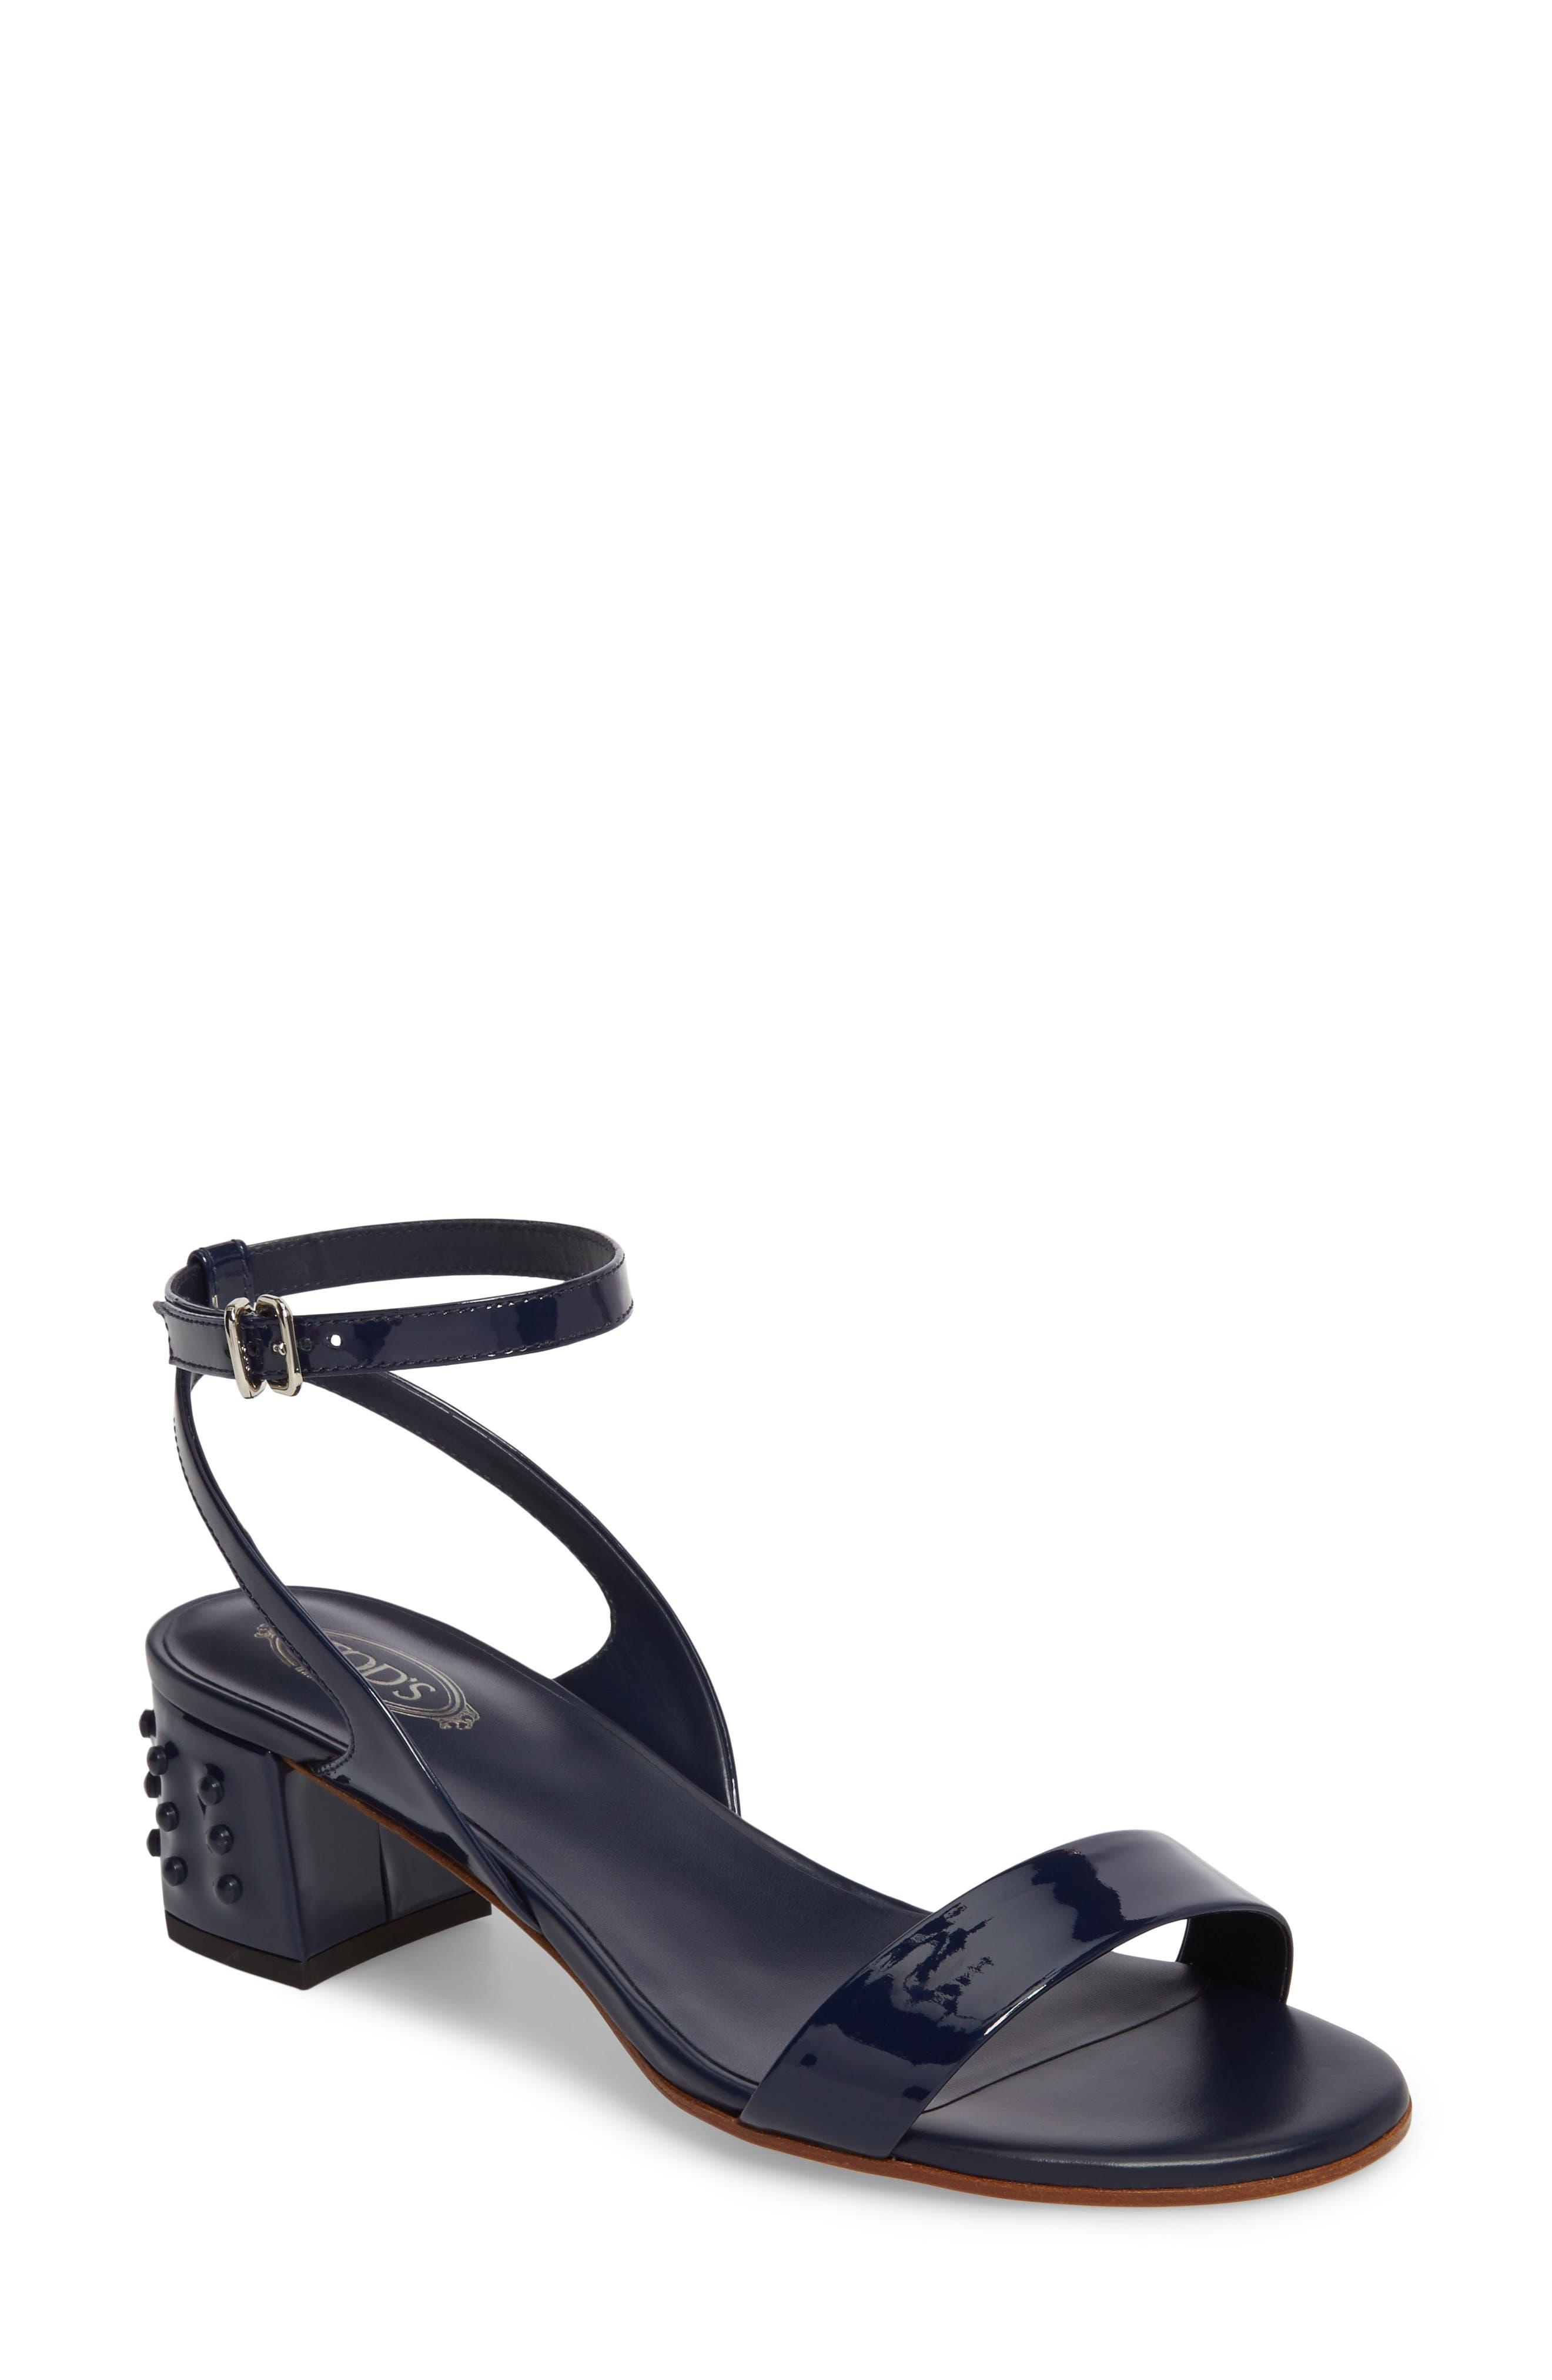 Gommini Block Heel Sandal,                             Main thumbnail 1, color,                             Navy